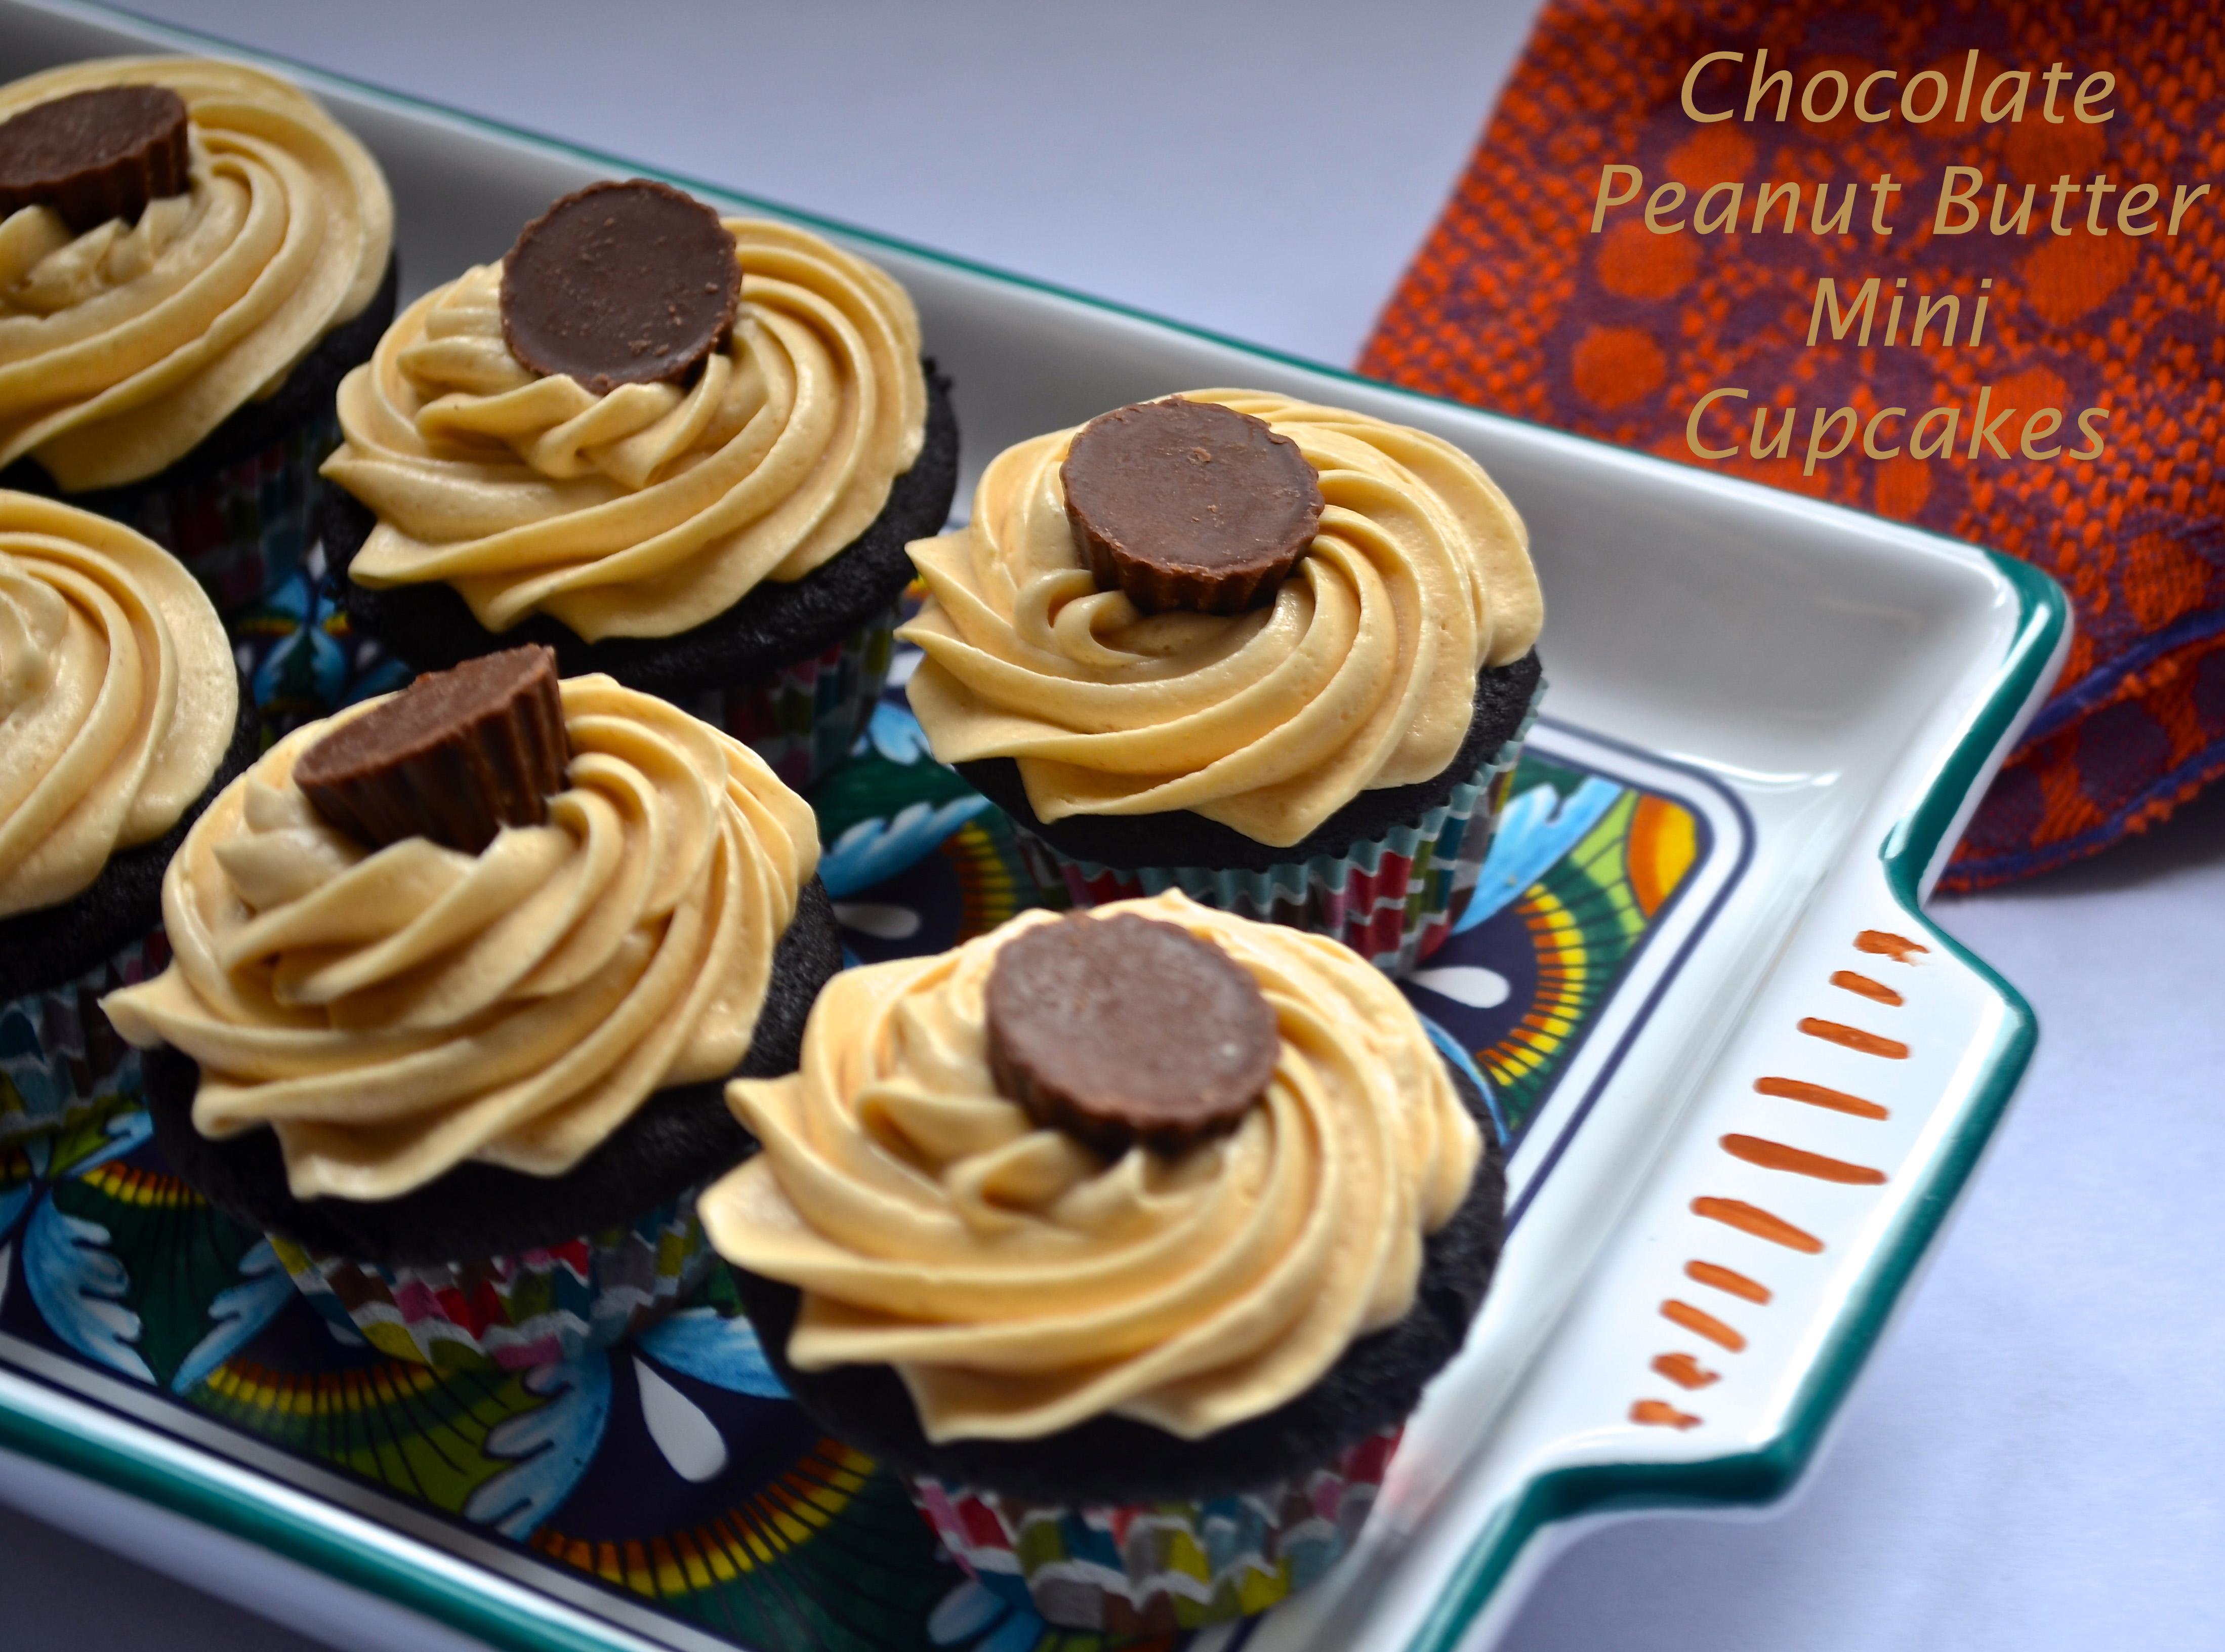 chocolate peanut butter mini cupcakes // pale yellow